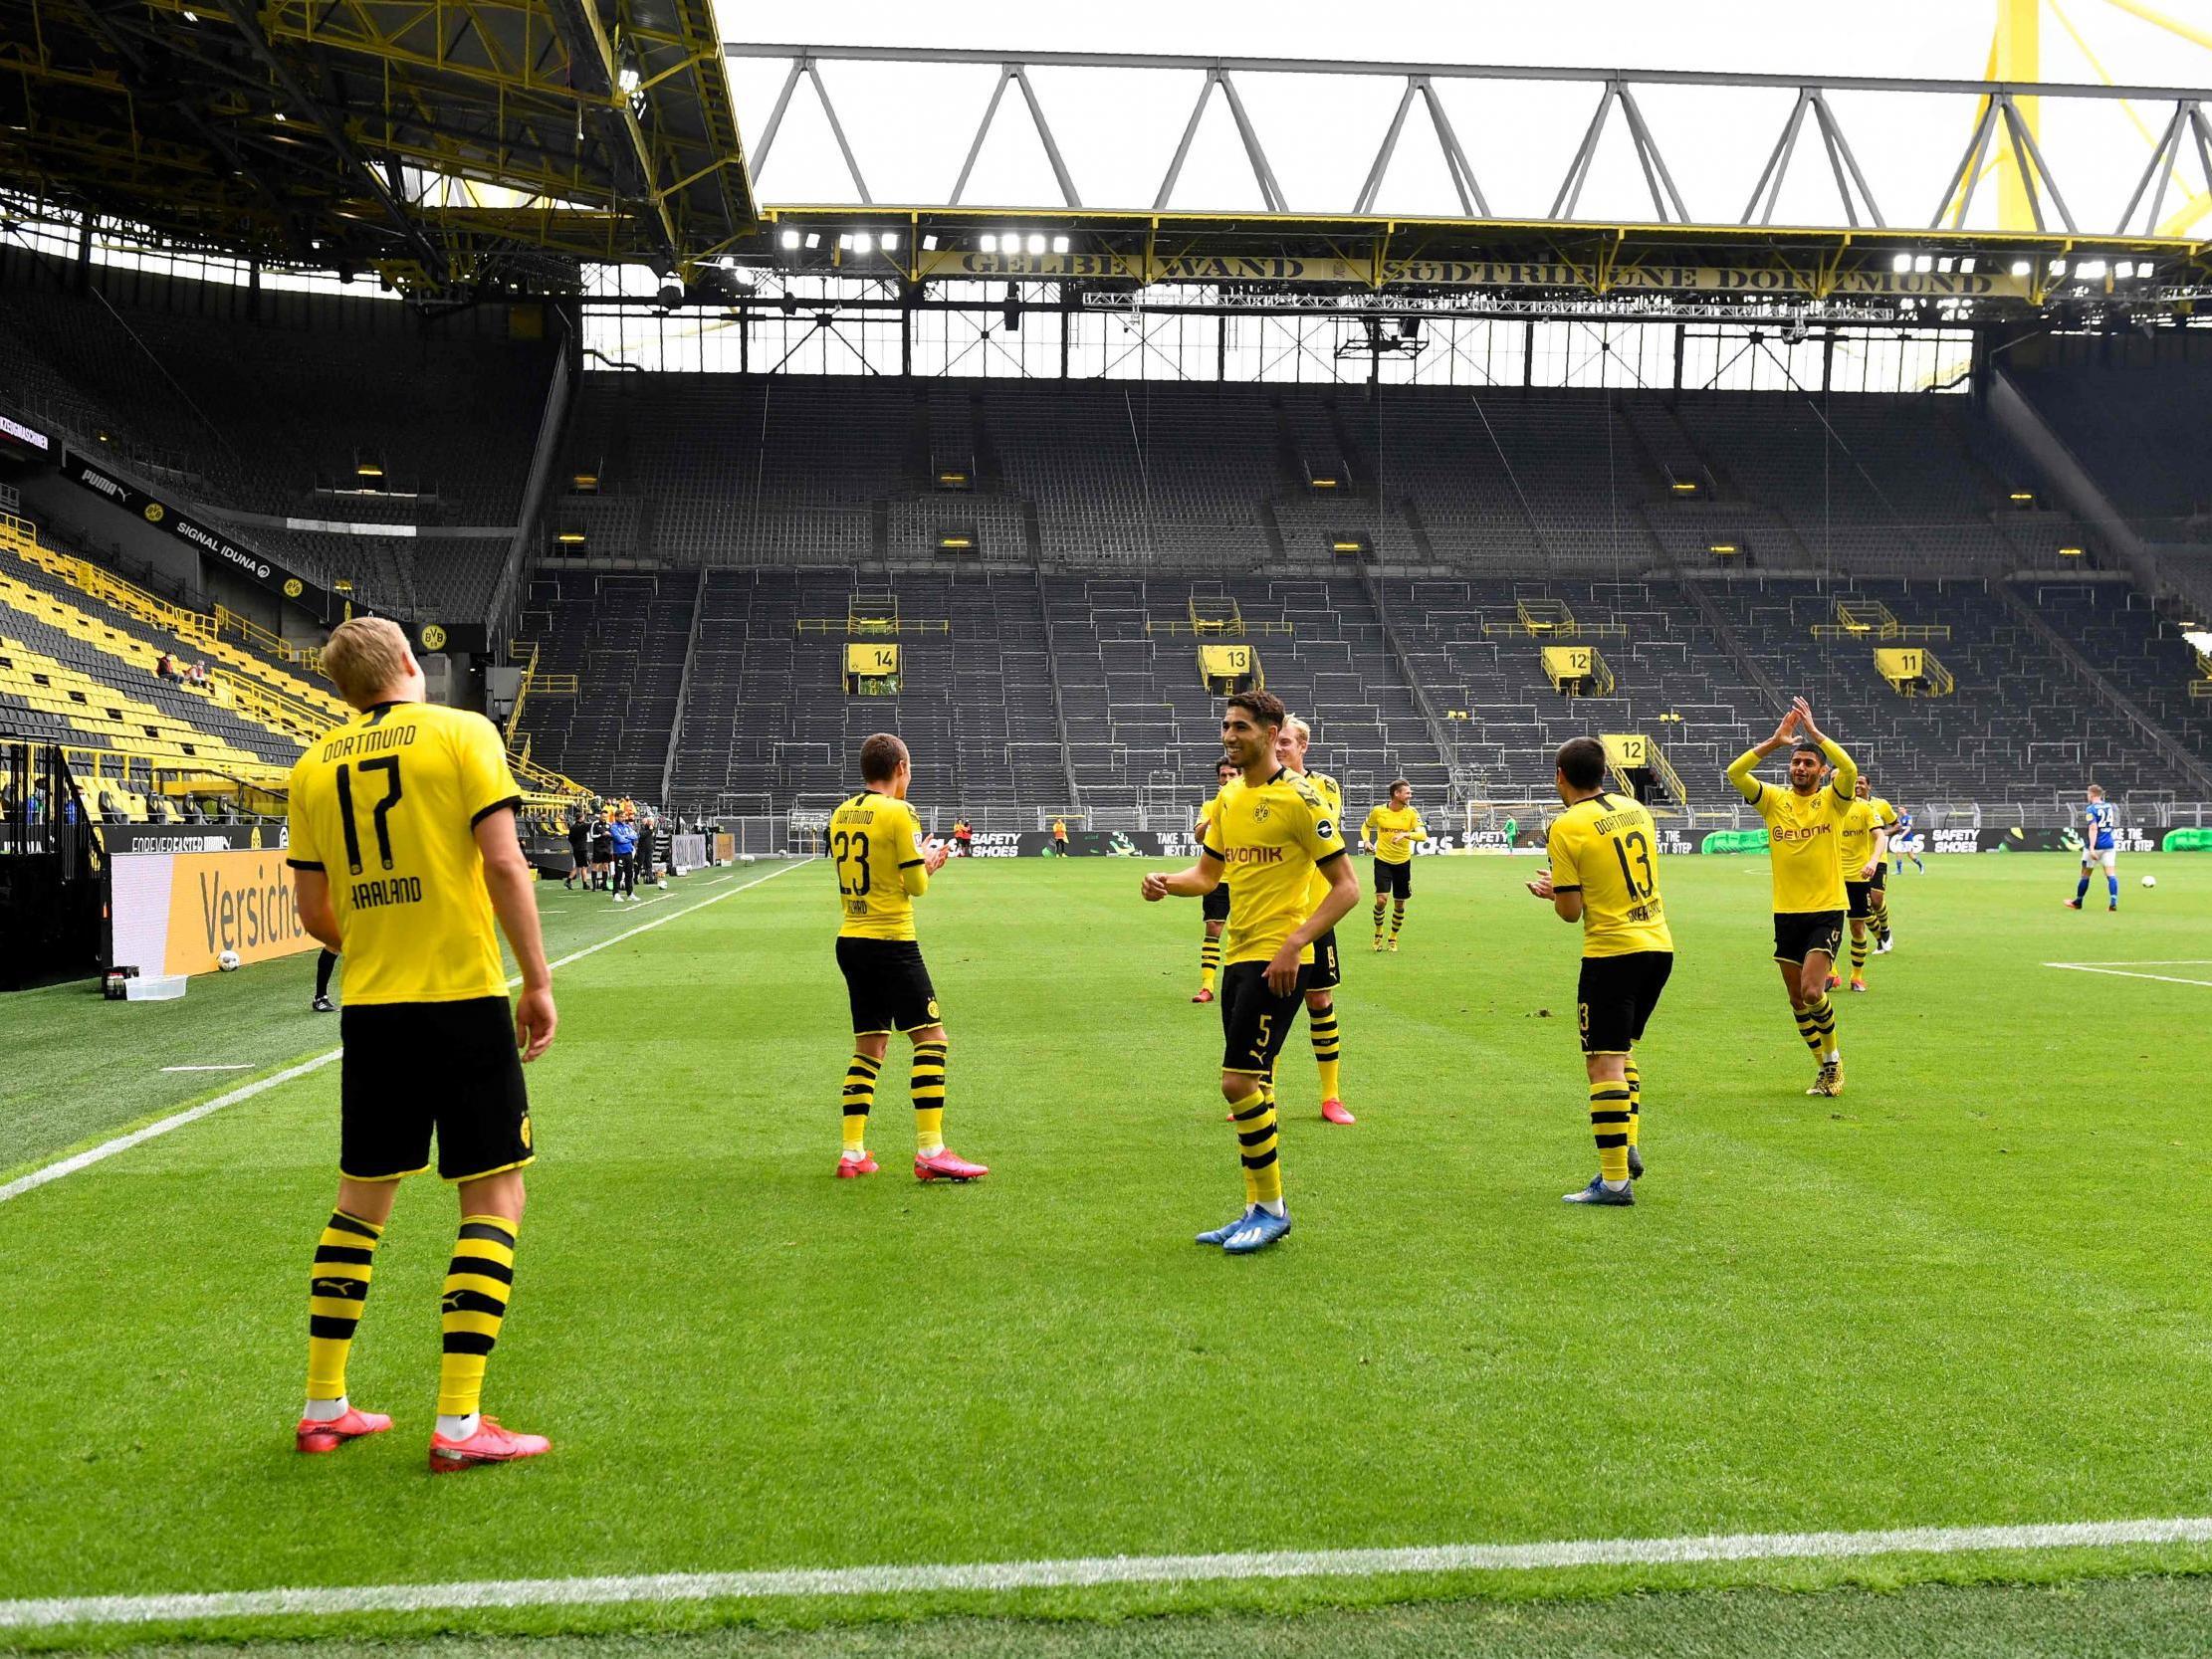 Wolfsburg vs Borussia Dortmund predicted line-ups: Team news and more ahead of Bundesliga fixture today